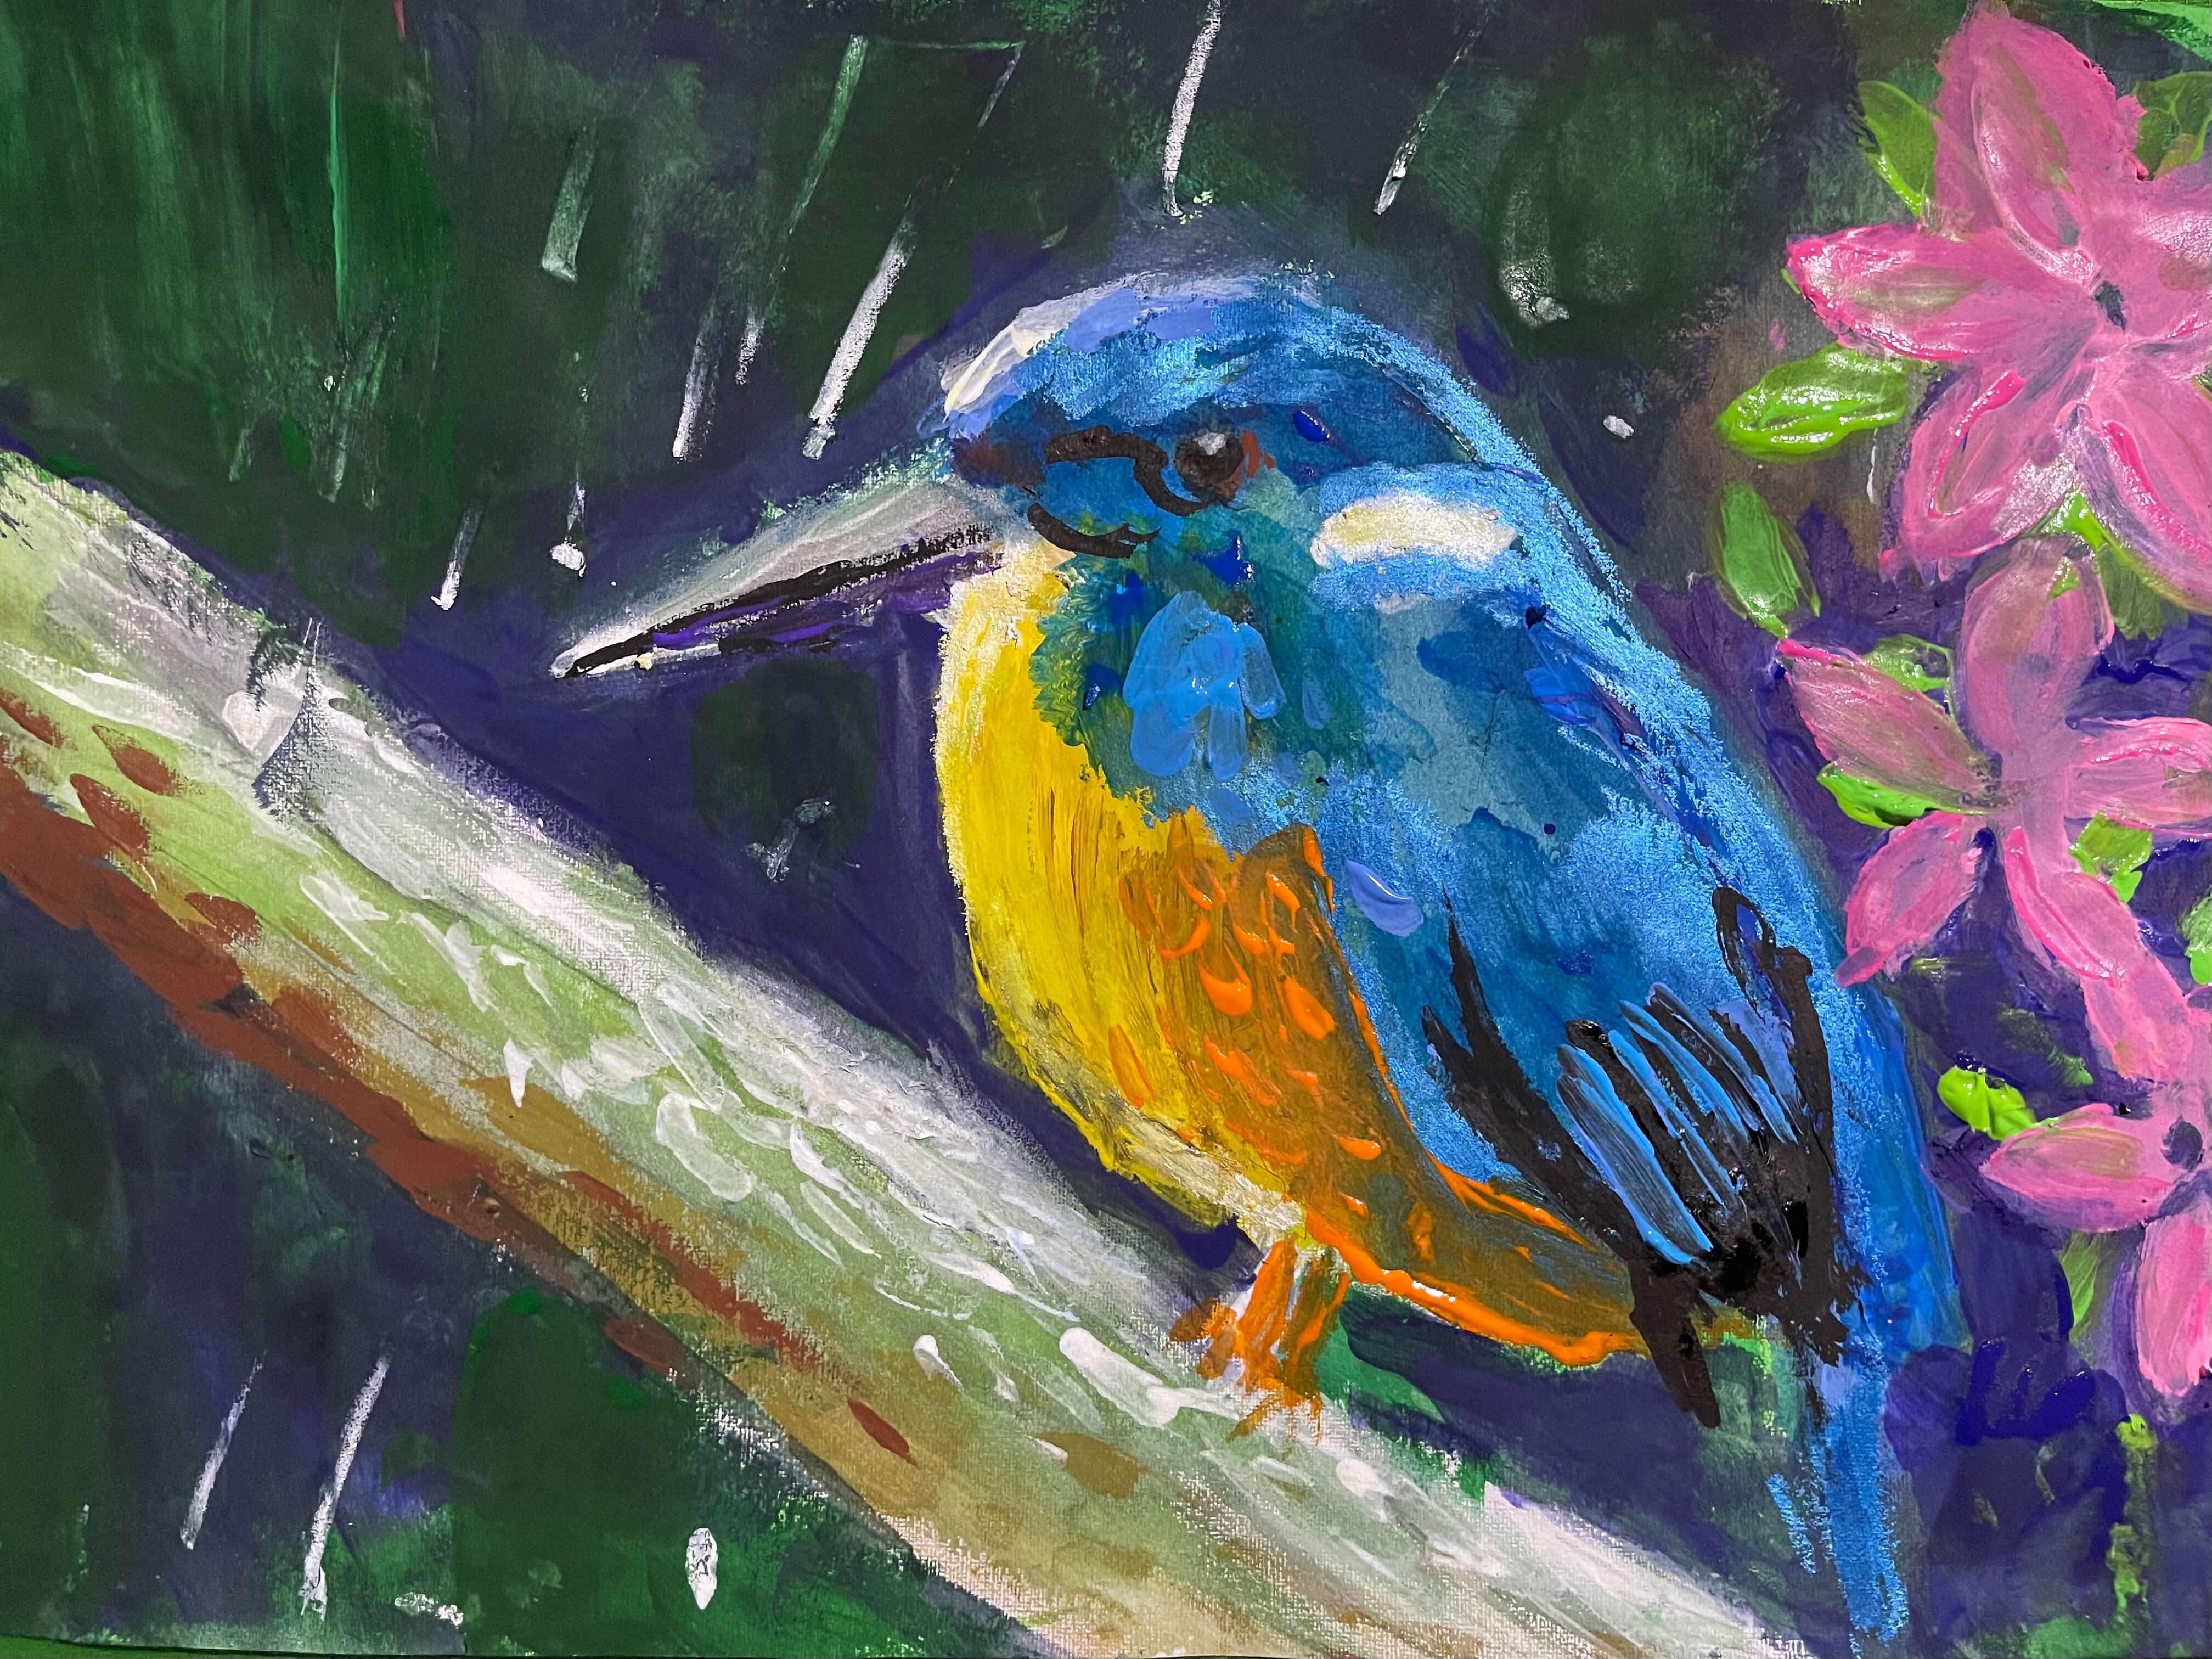 Tasmanian Azure Kingfisher by Isabella, age 7.